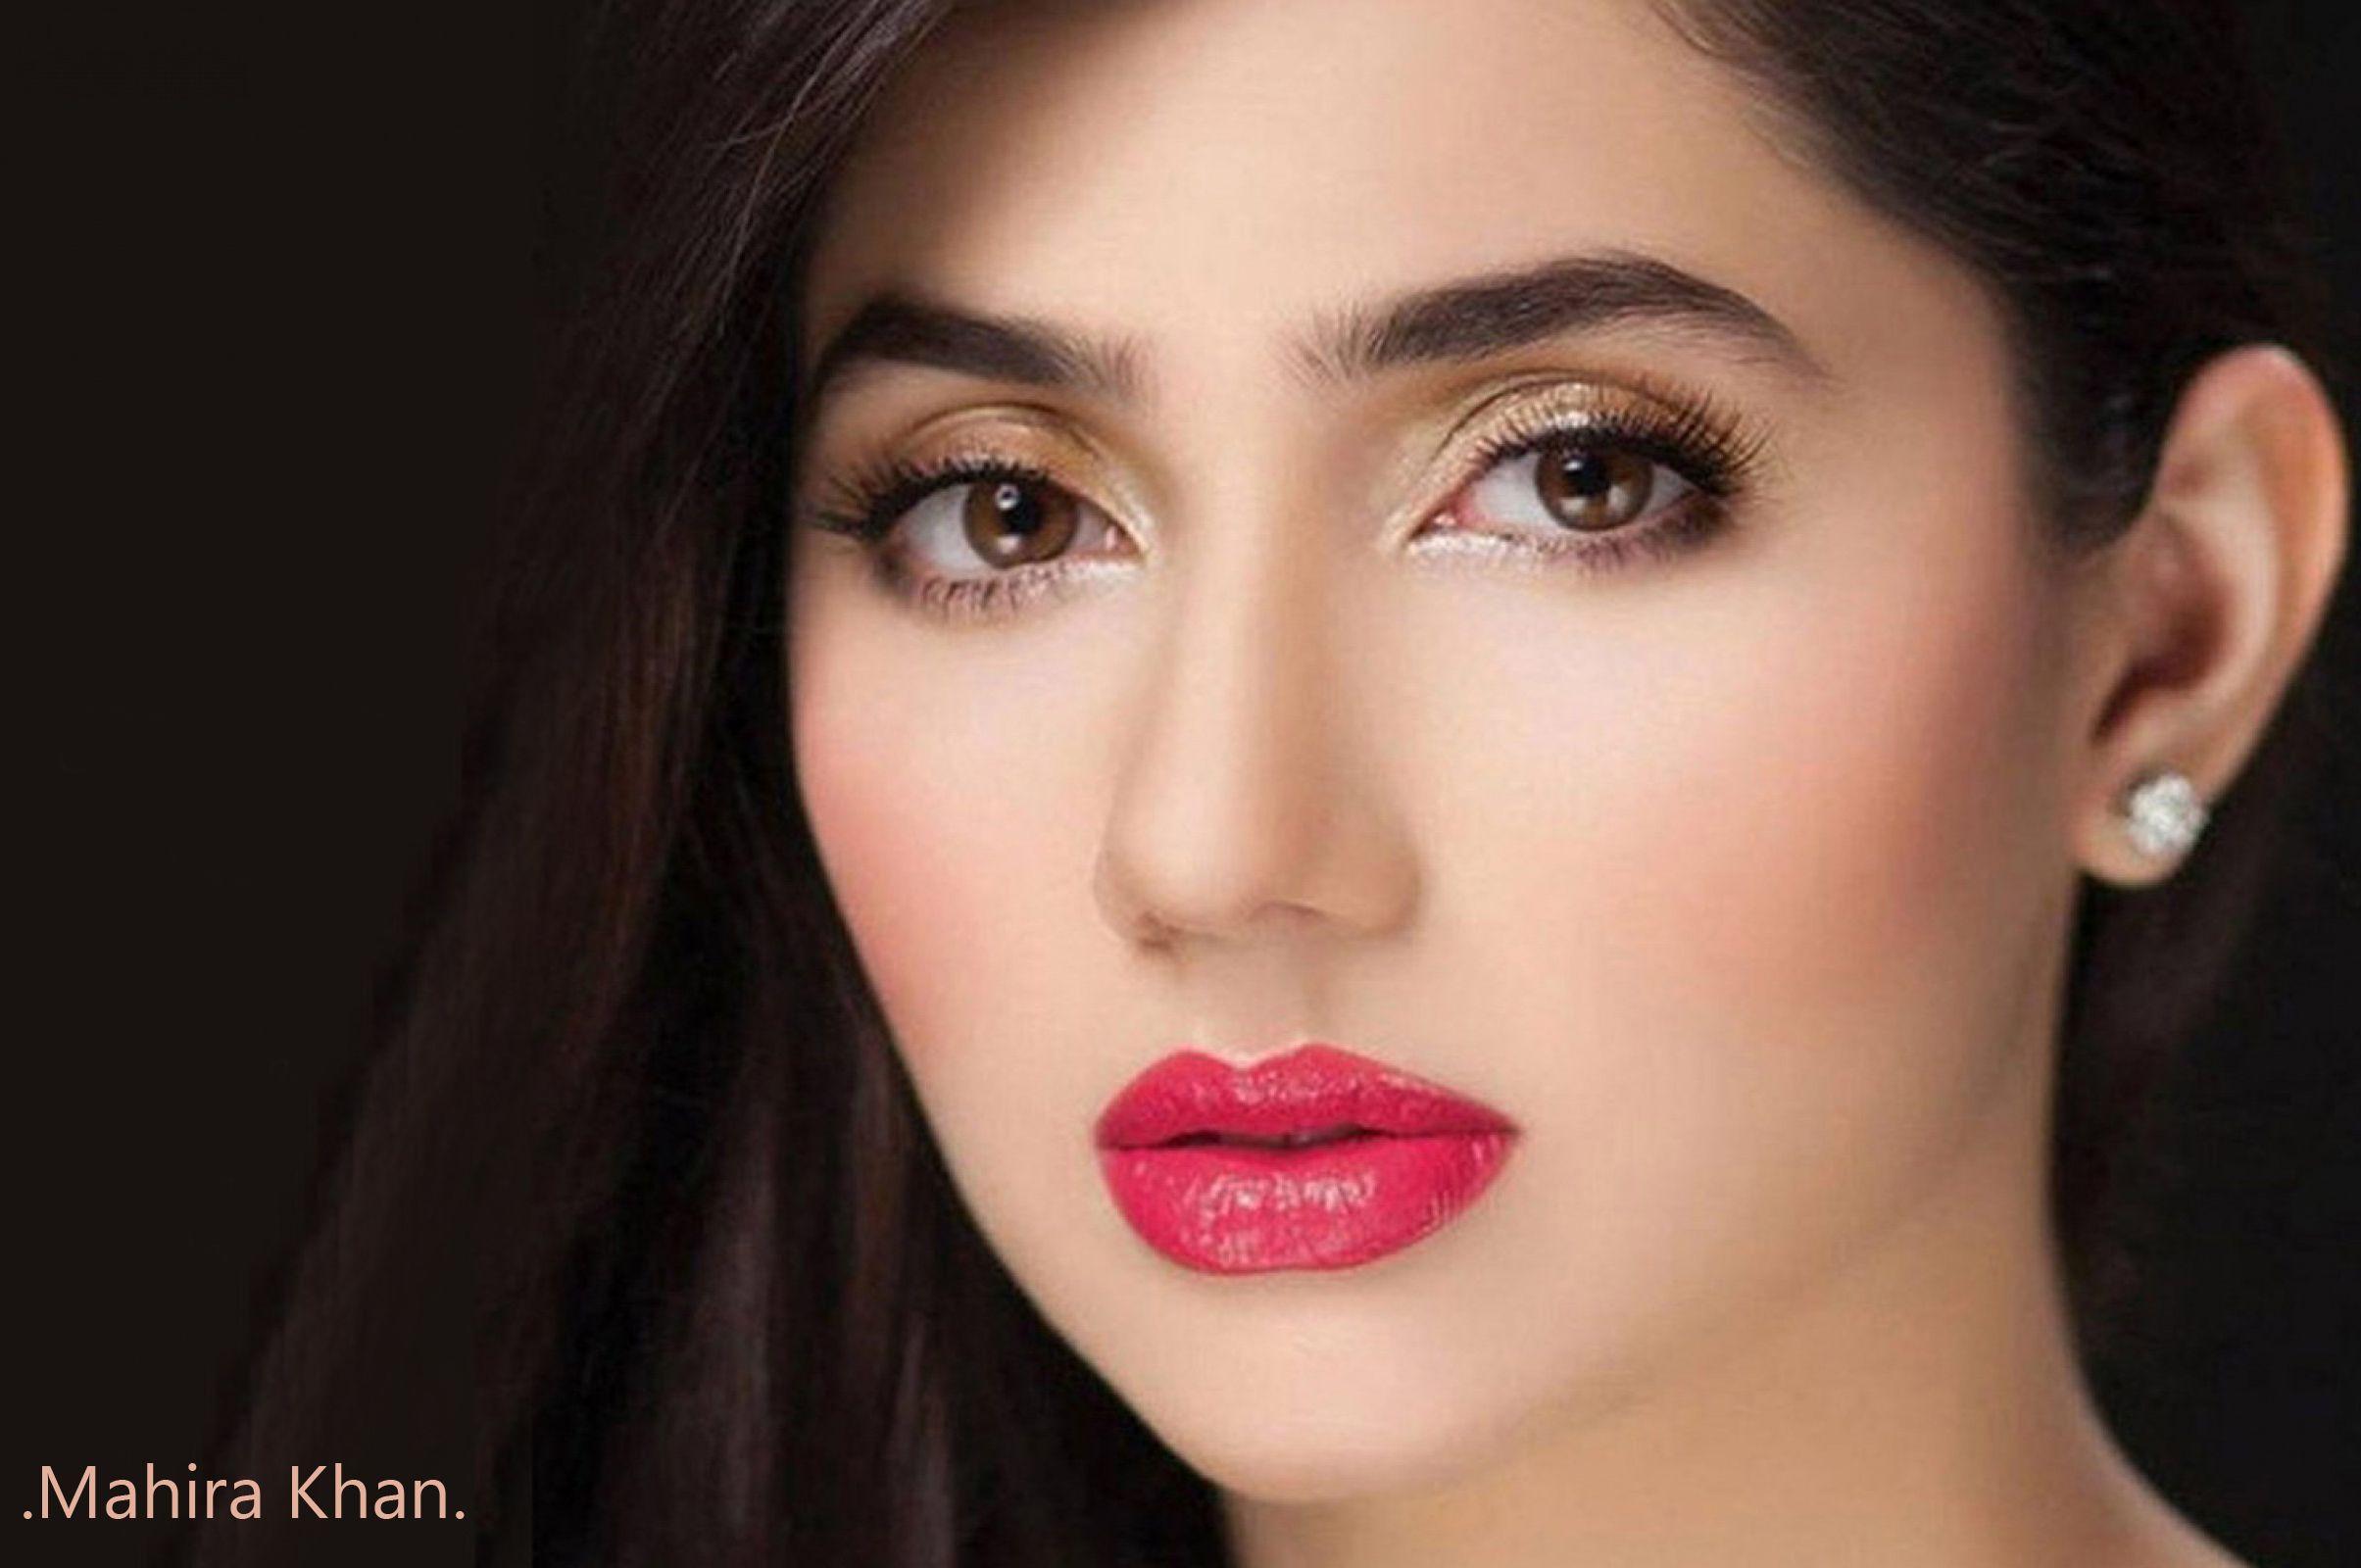 Mahira Khan Close Up Photo - Indian Celebrity Wallpaper - HD